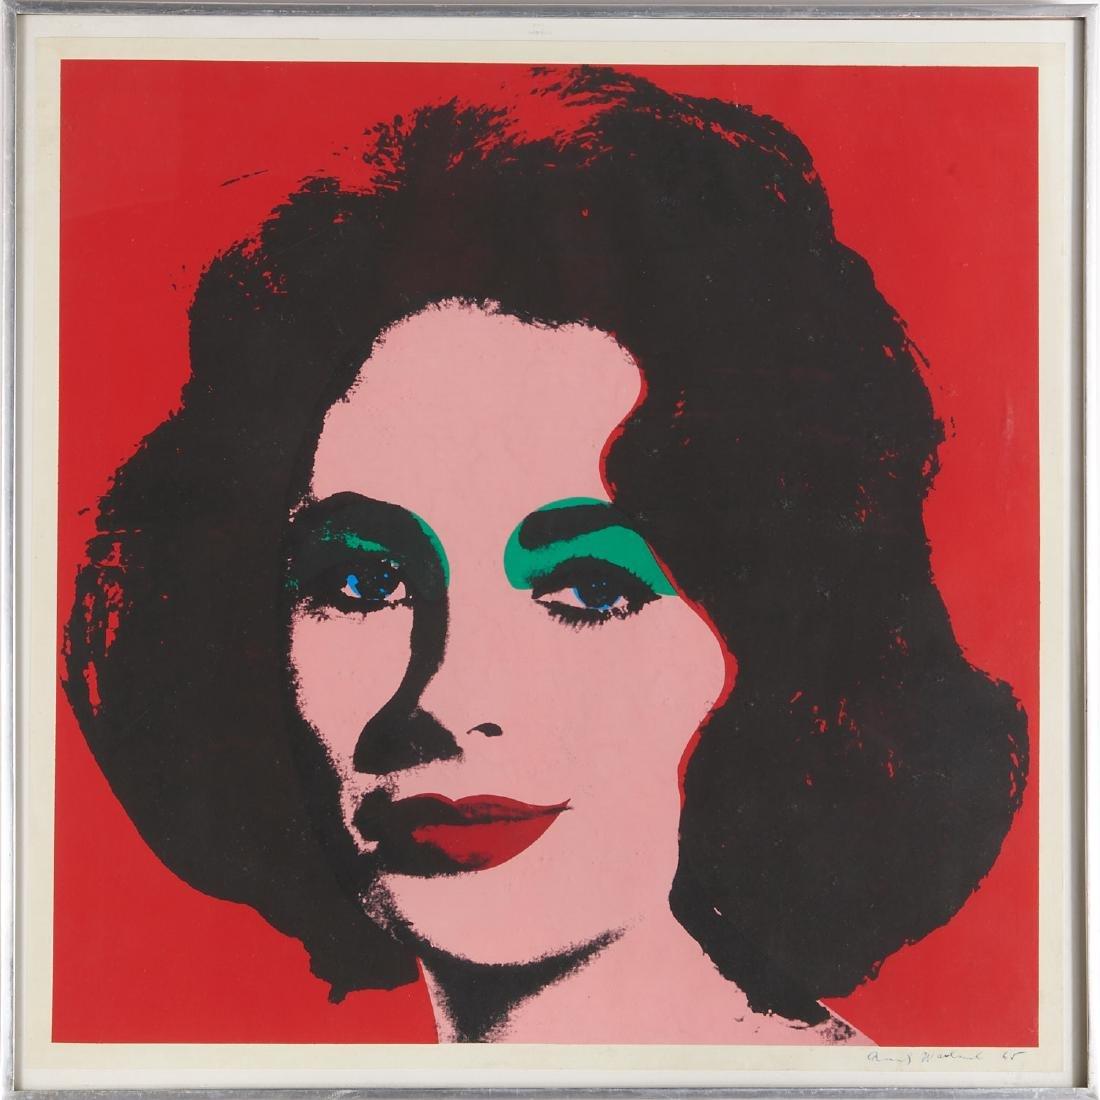 Andy Warhol, print